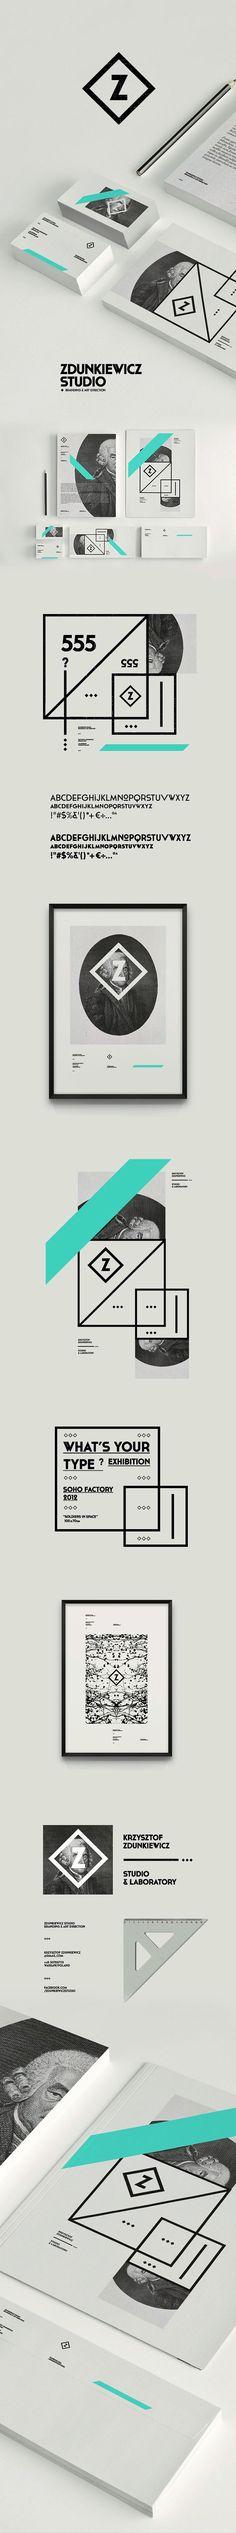 Zdunkiewicz Studio / Self Promotion #branding #identity #zdunkiewicsstudio. If you like UX, design, or design thinking, check out theuxblog.com